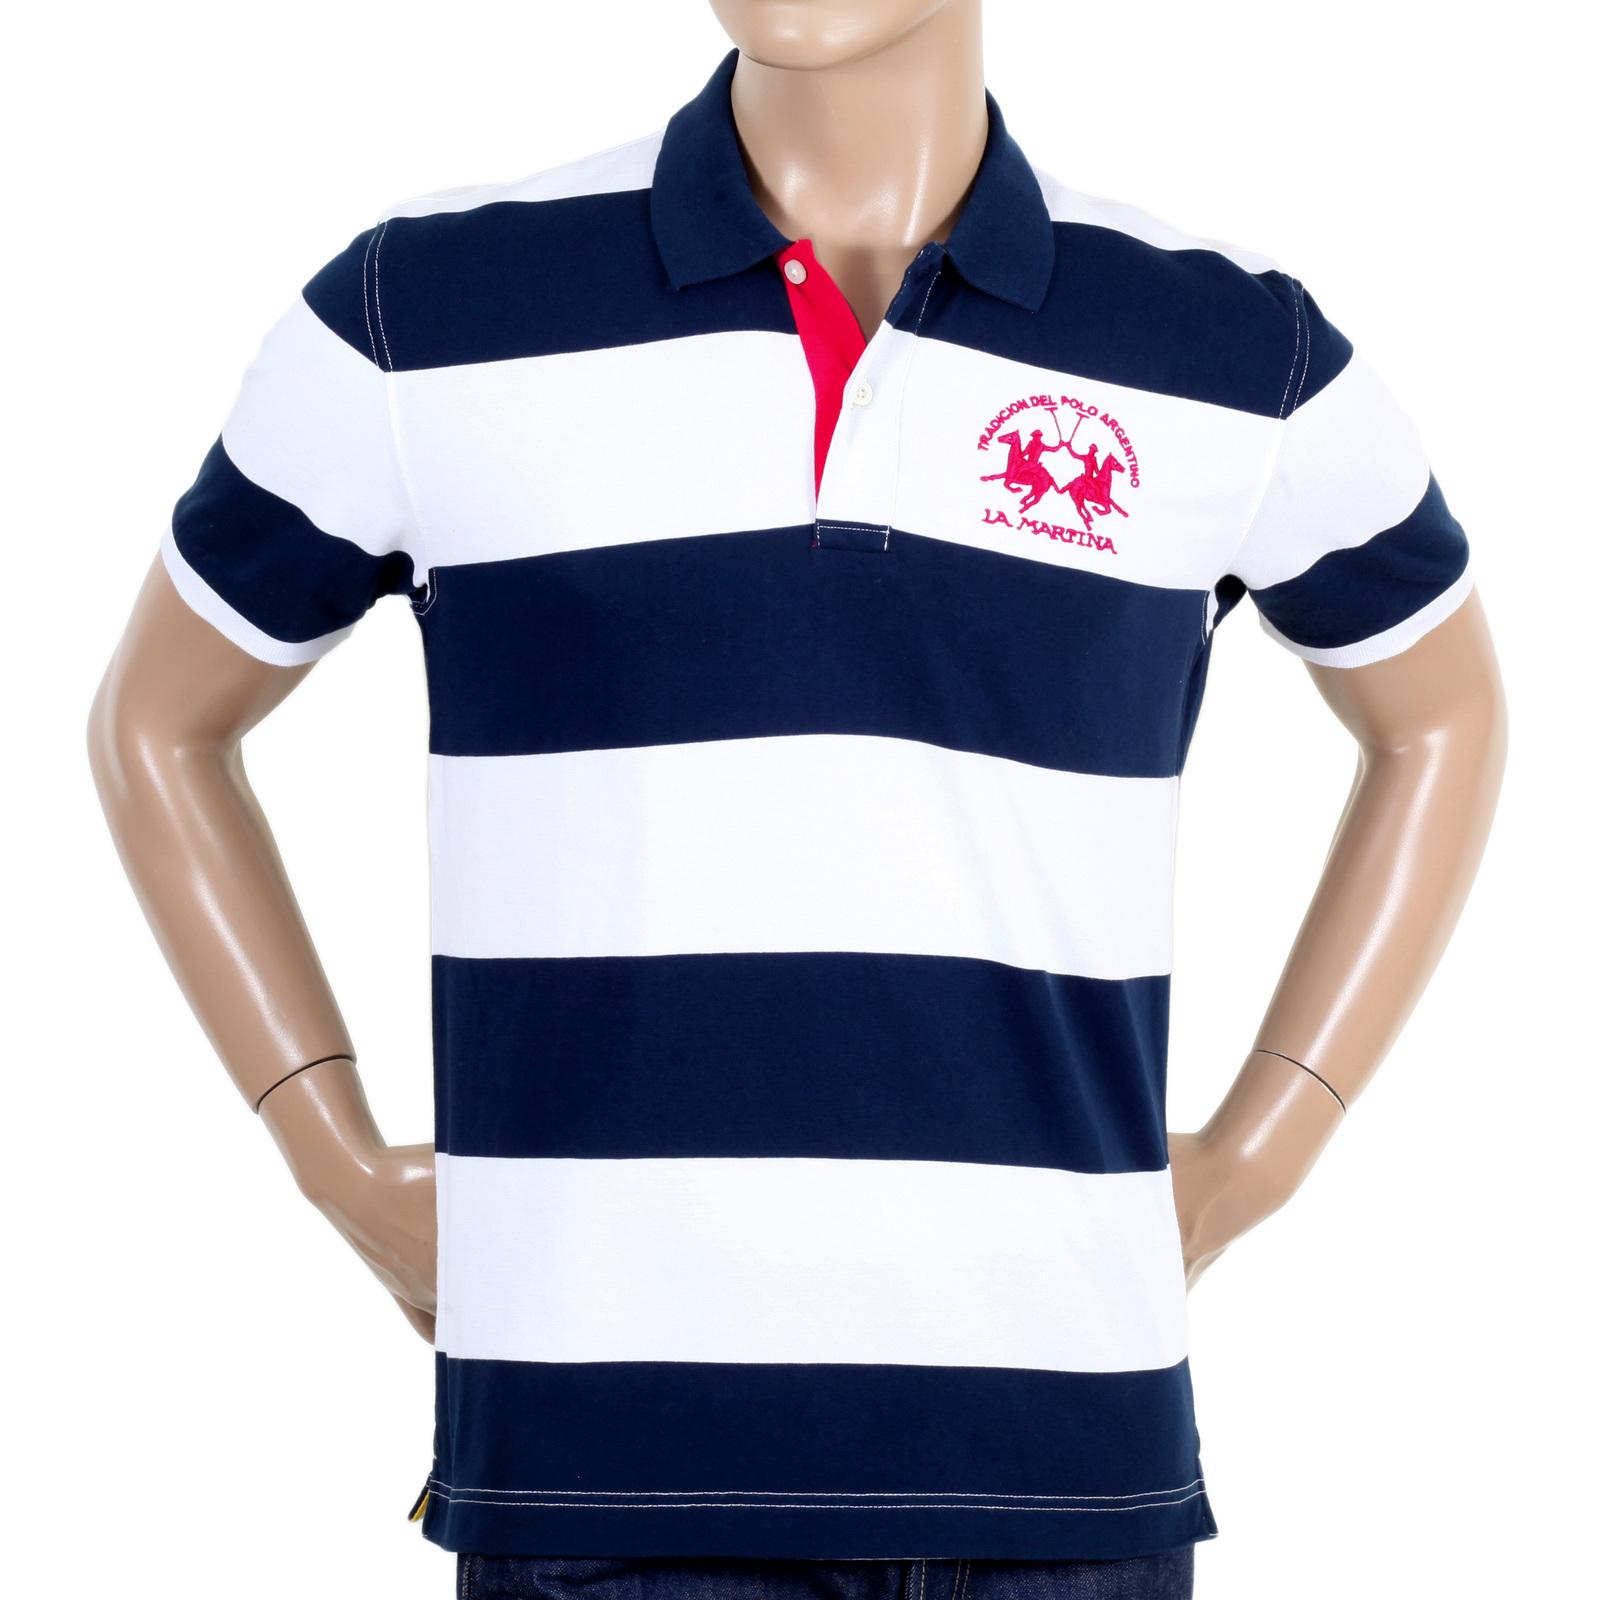 9459418a La Martina Polo Shirts Shop Online - DREAMWORKS